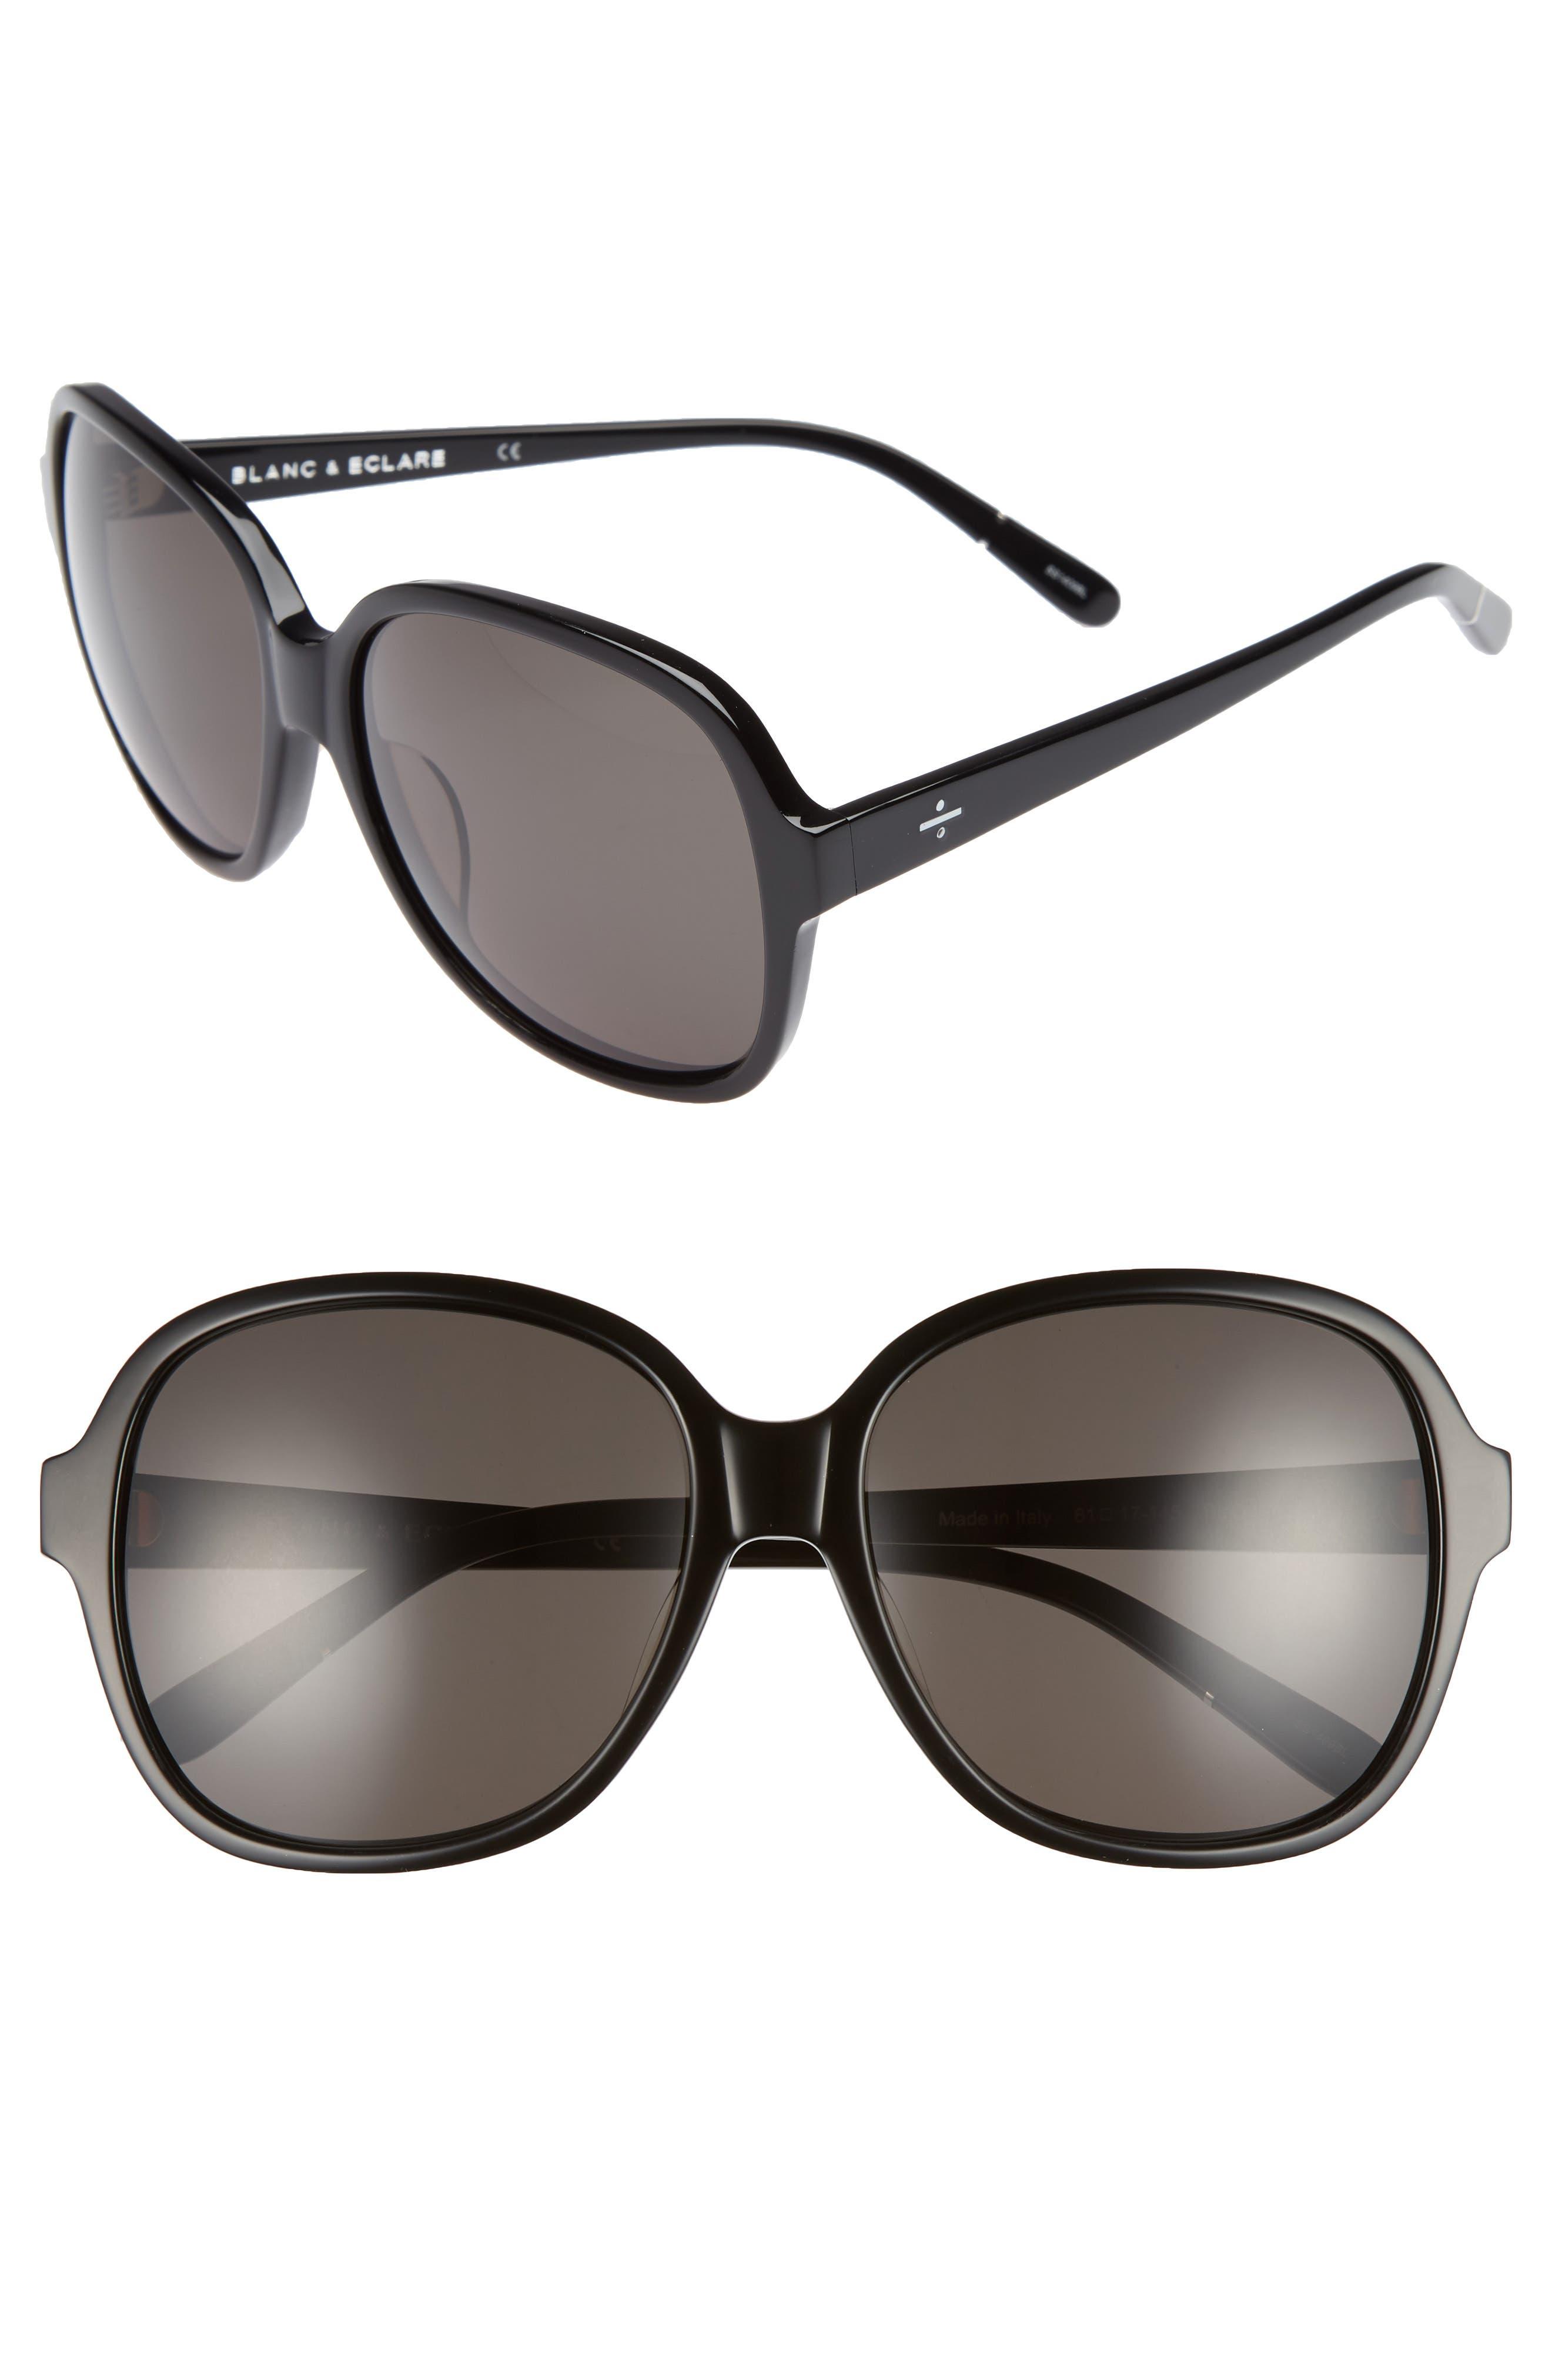 BLANC & ECLARE Beijing 61mm Polarized Sunglasses,                             Main thumbnail 1, color,                             Black